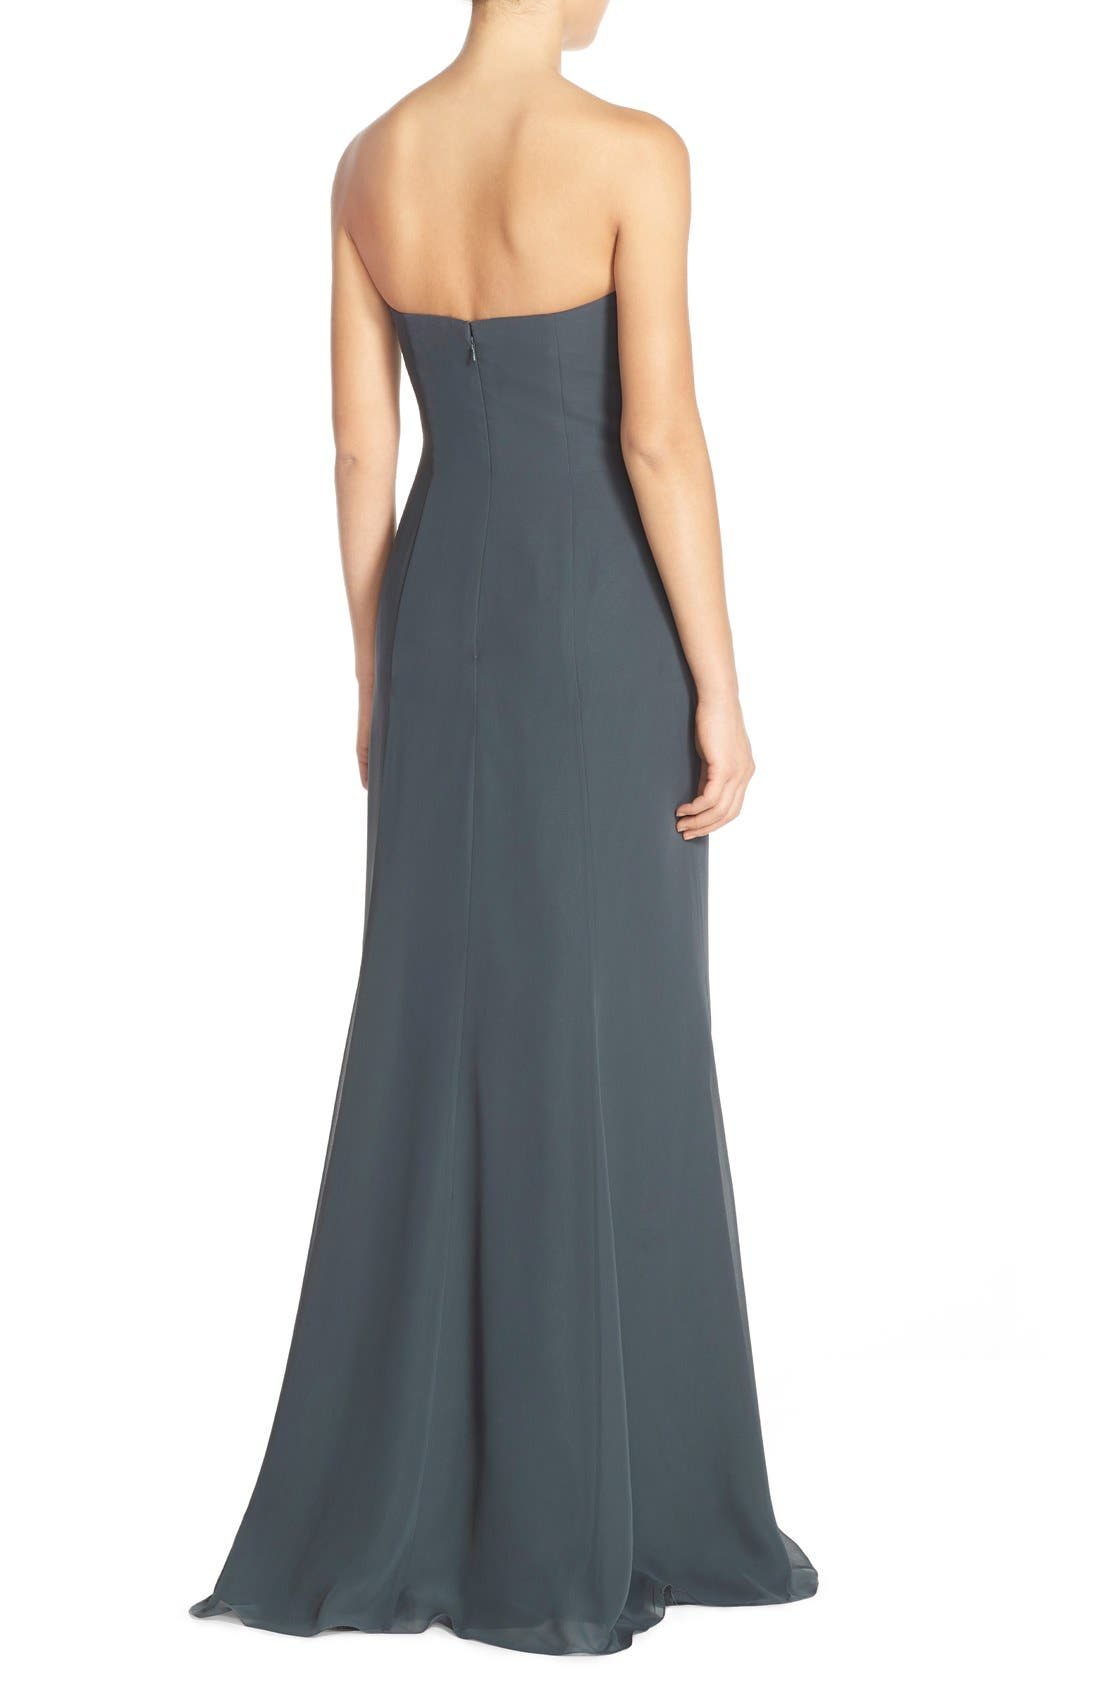 Raquel Front Slit Strapless Chiffon Gown,                             Alternate thumbnail 3, color,                             026